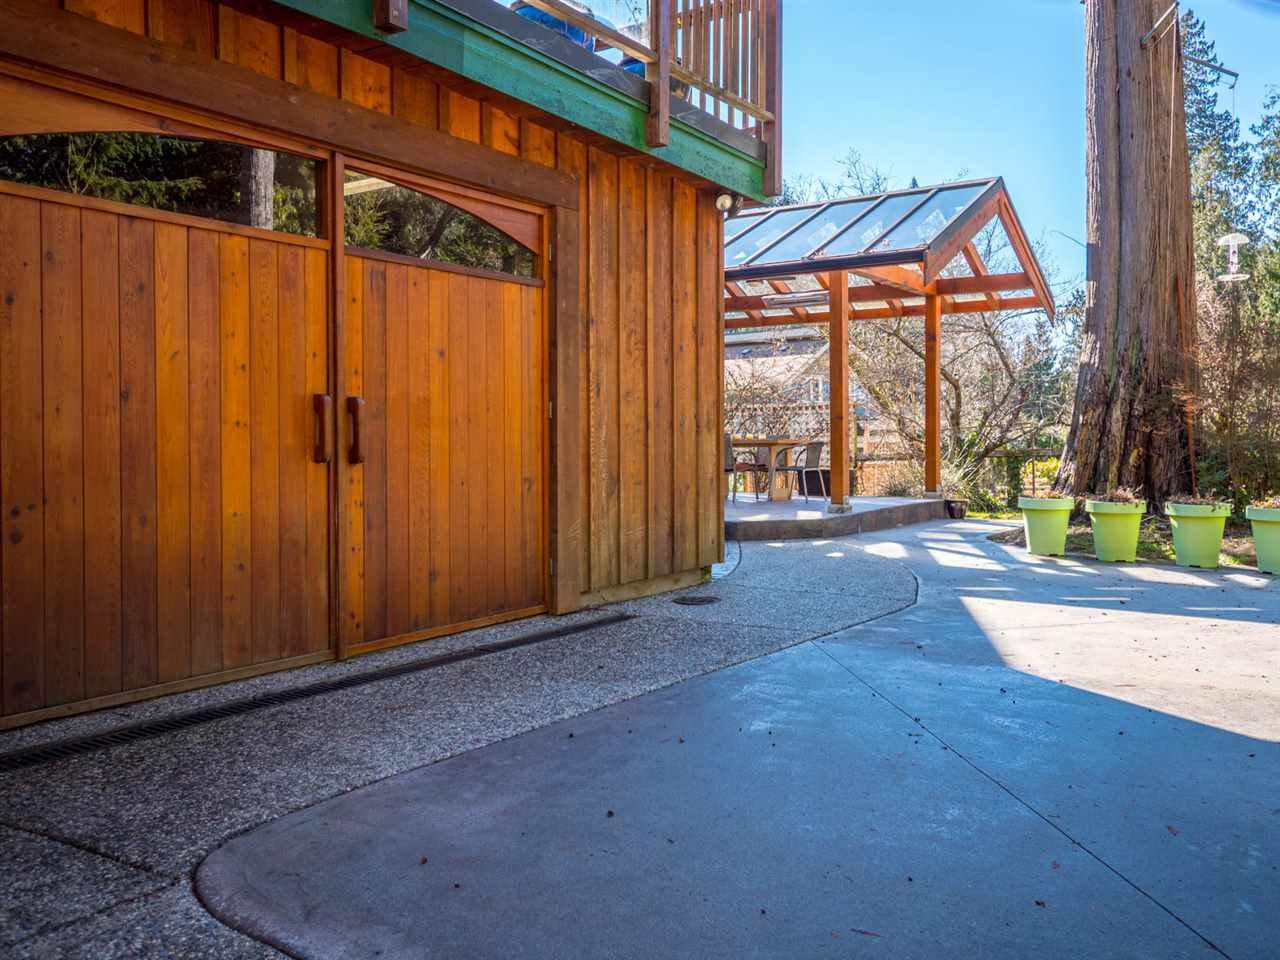 Photo 15: Photos: 3592 BEACH Avenue: Roberts Creek House for sale (Sunshine Coast)  : MLS®# R2244747